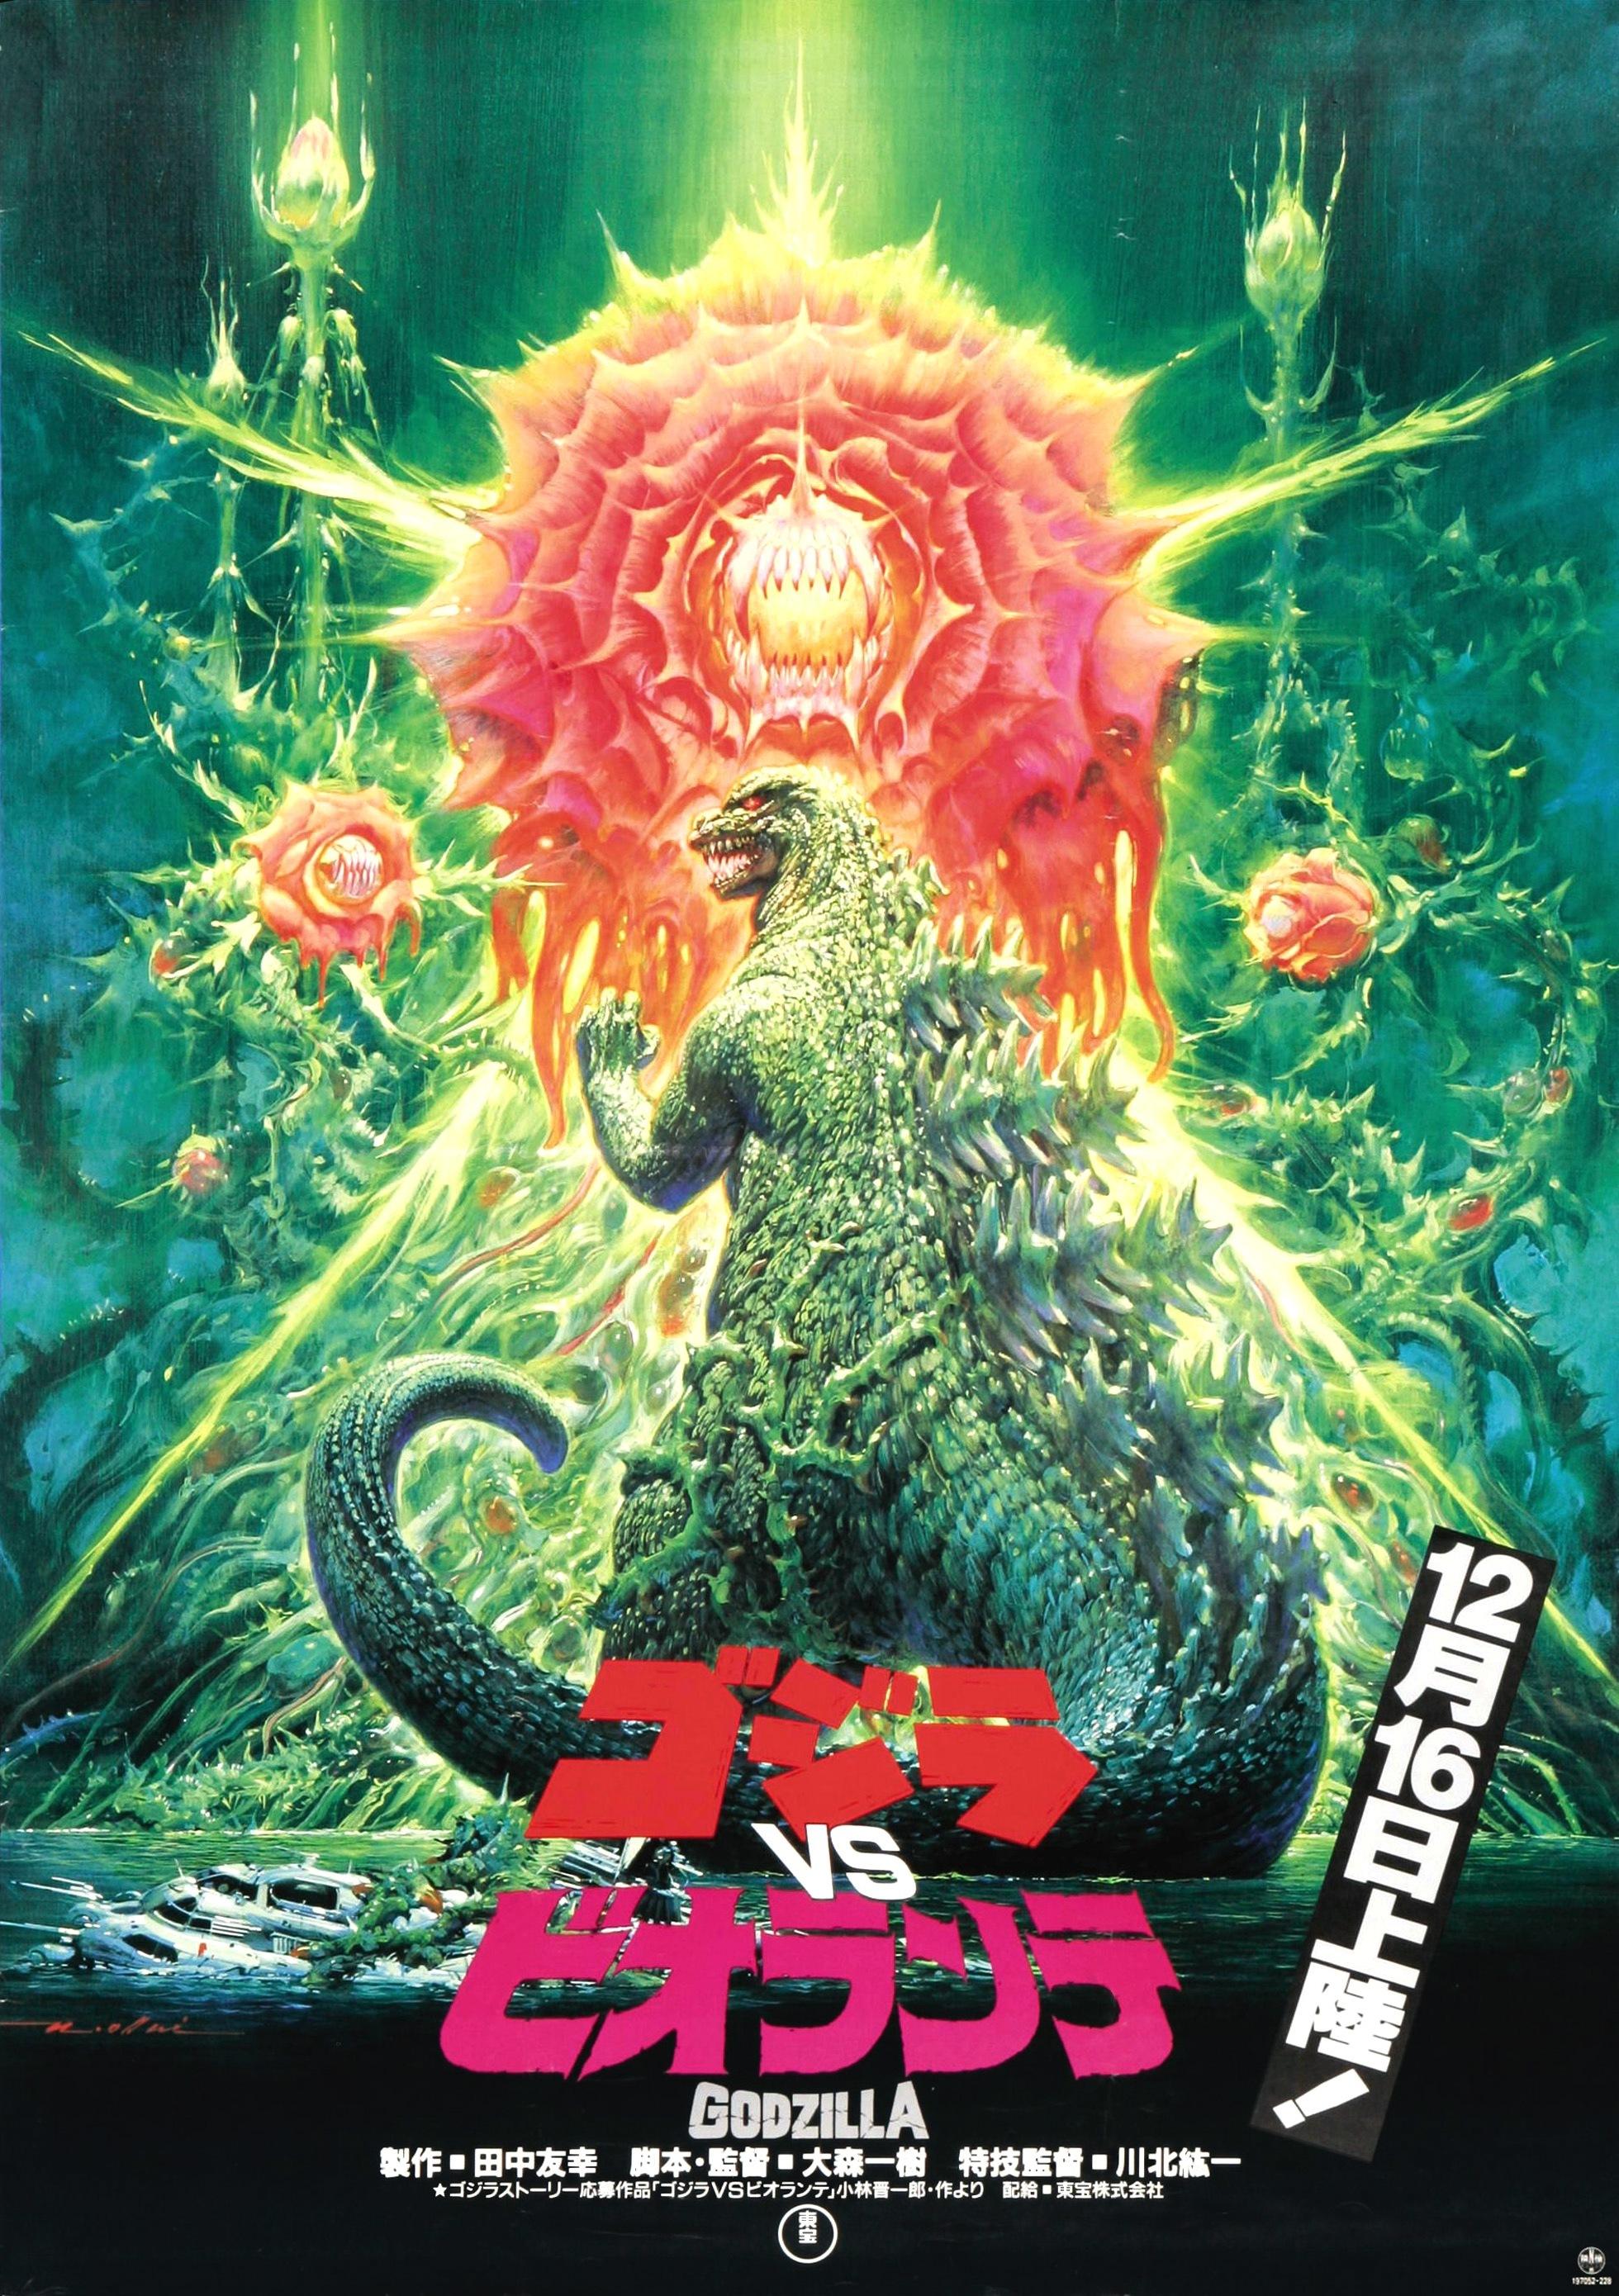 Godzilla vs. Biollante kapak